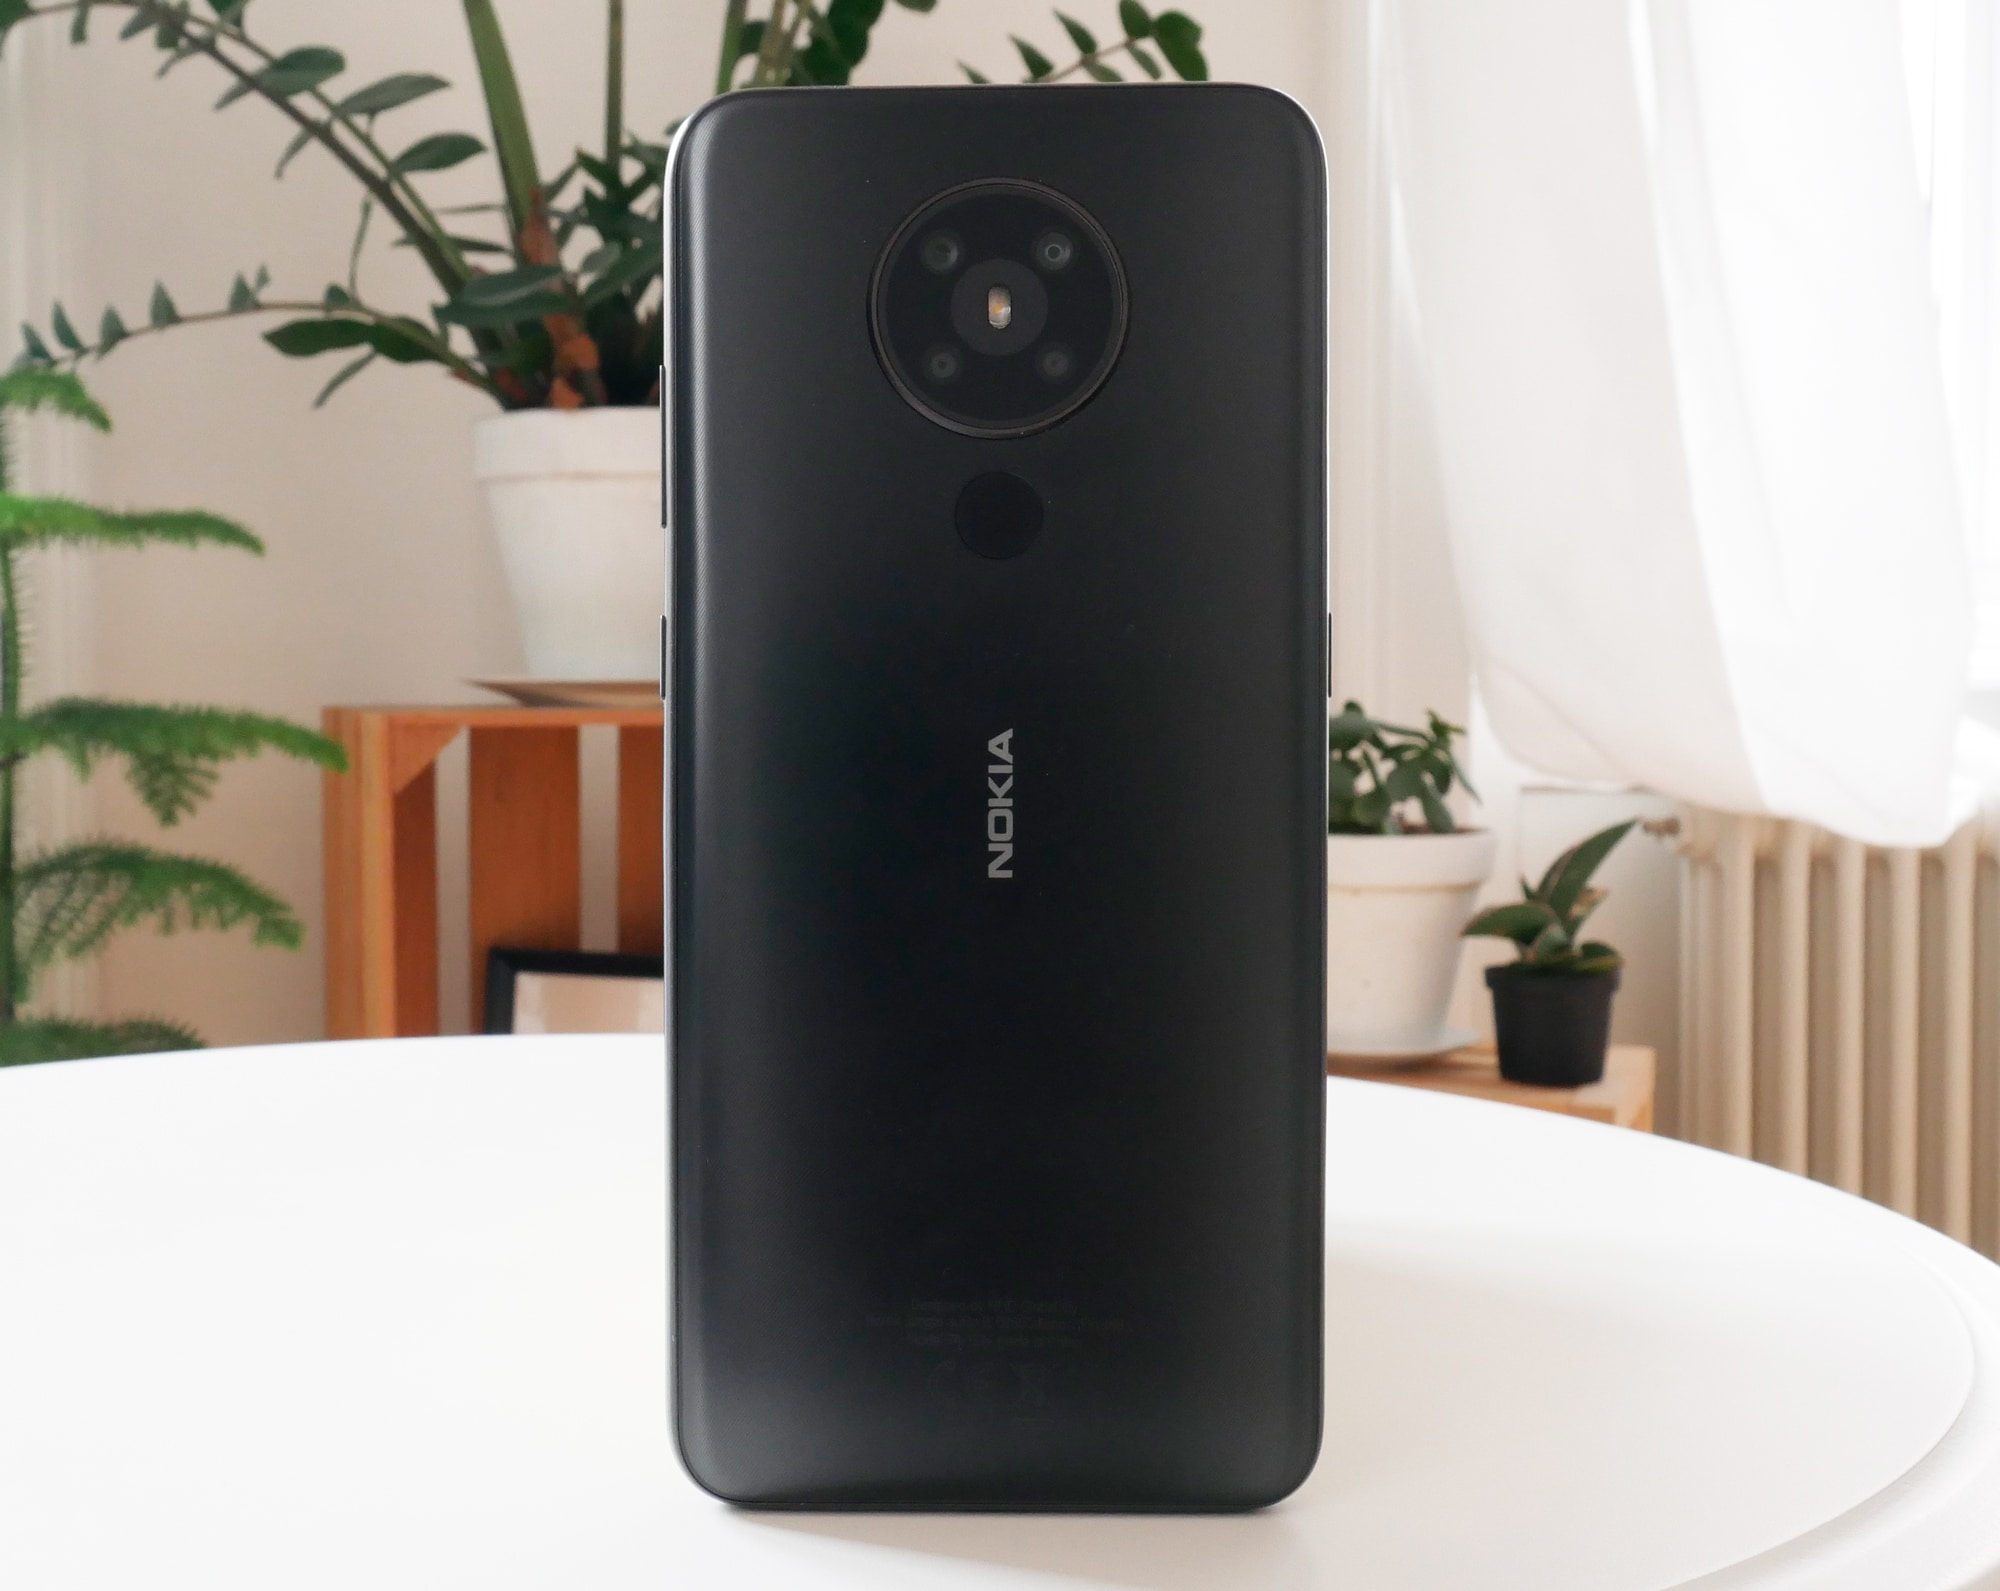 Nokia 5.3 Rückseite mit vier Kameras.